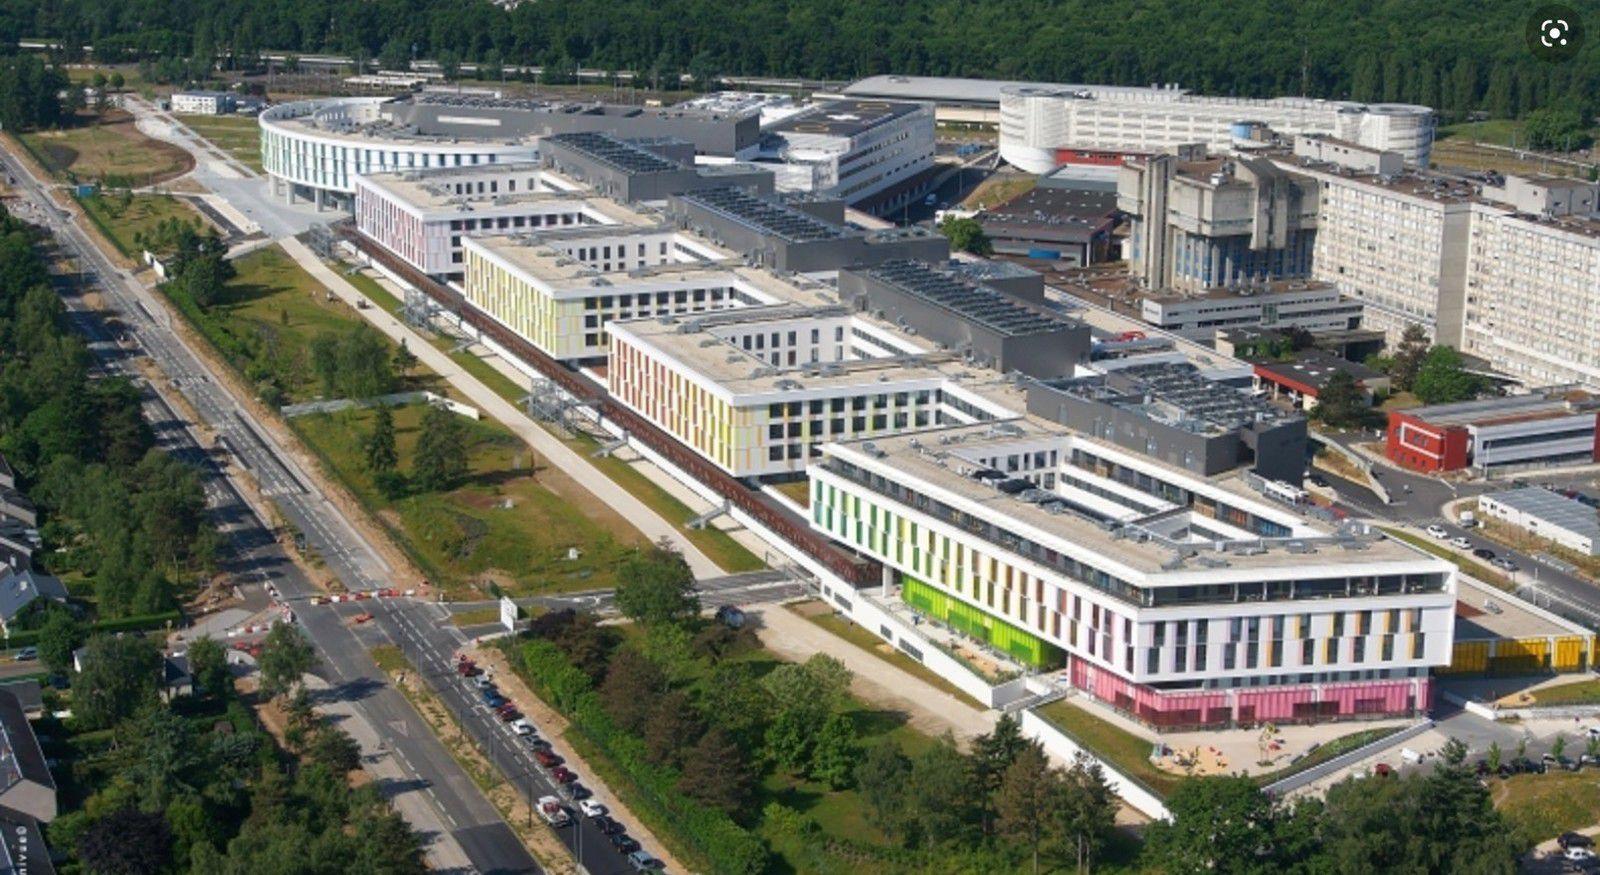 Covid-19 : comment l'hôpital d'Orléans a su s'adapter